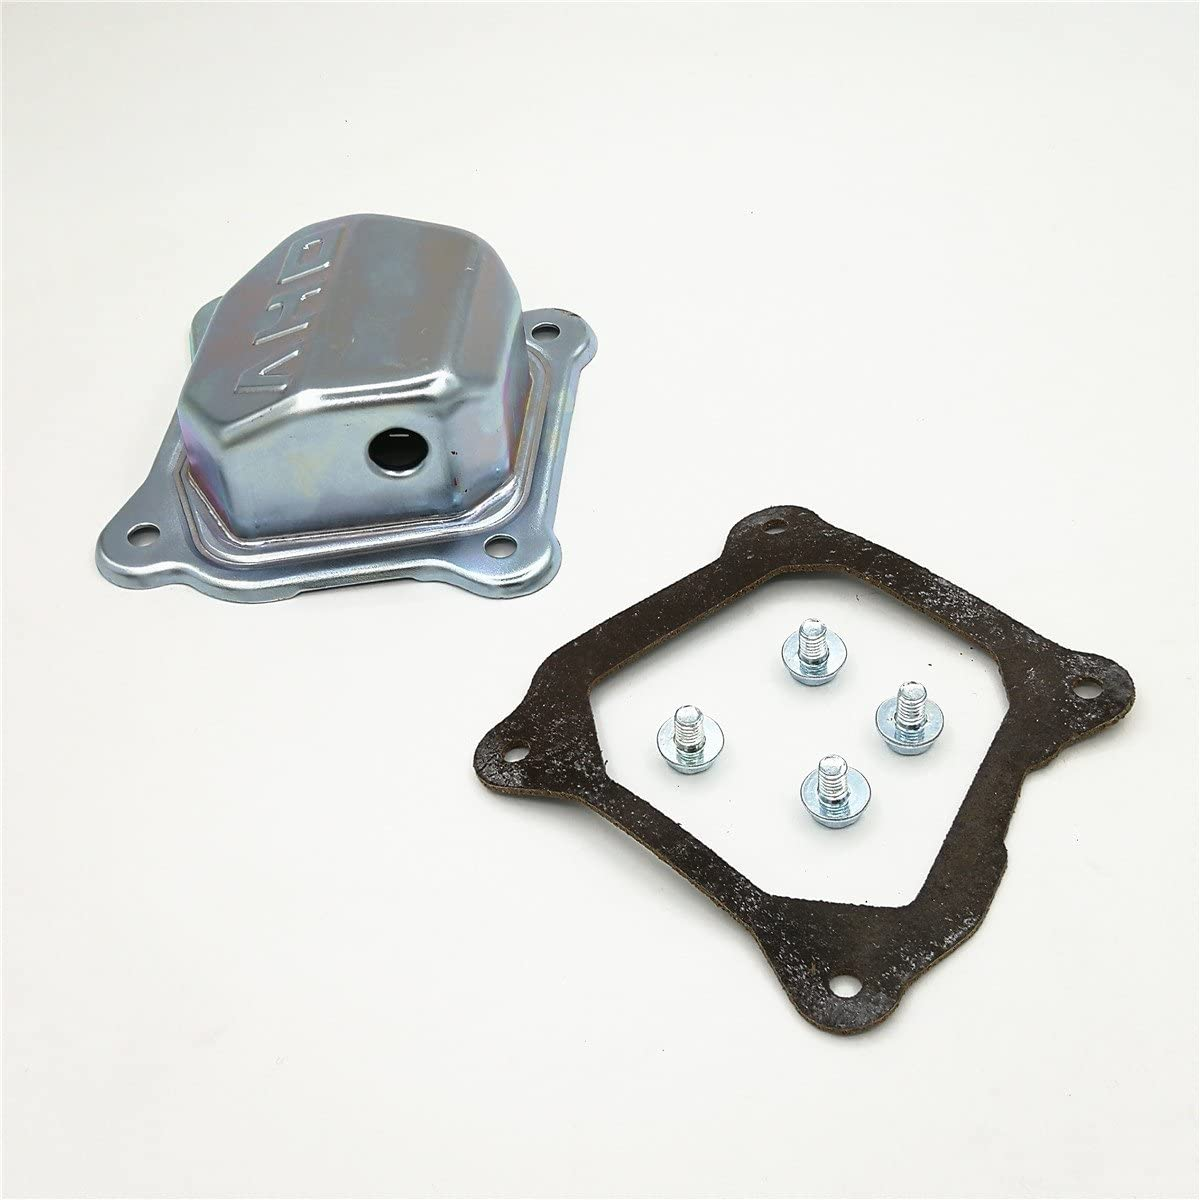 Cancanle Valve Head Cover Seal Gasket Screw For HONDA GX110 GX120 GX140 GX160 GX200 Chinese 168F 170F 5.5HP 6.5HP Engine Generator